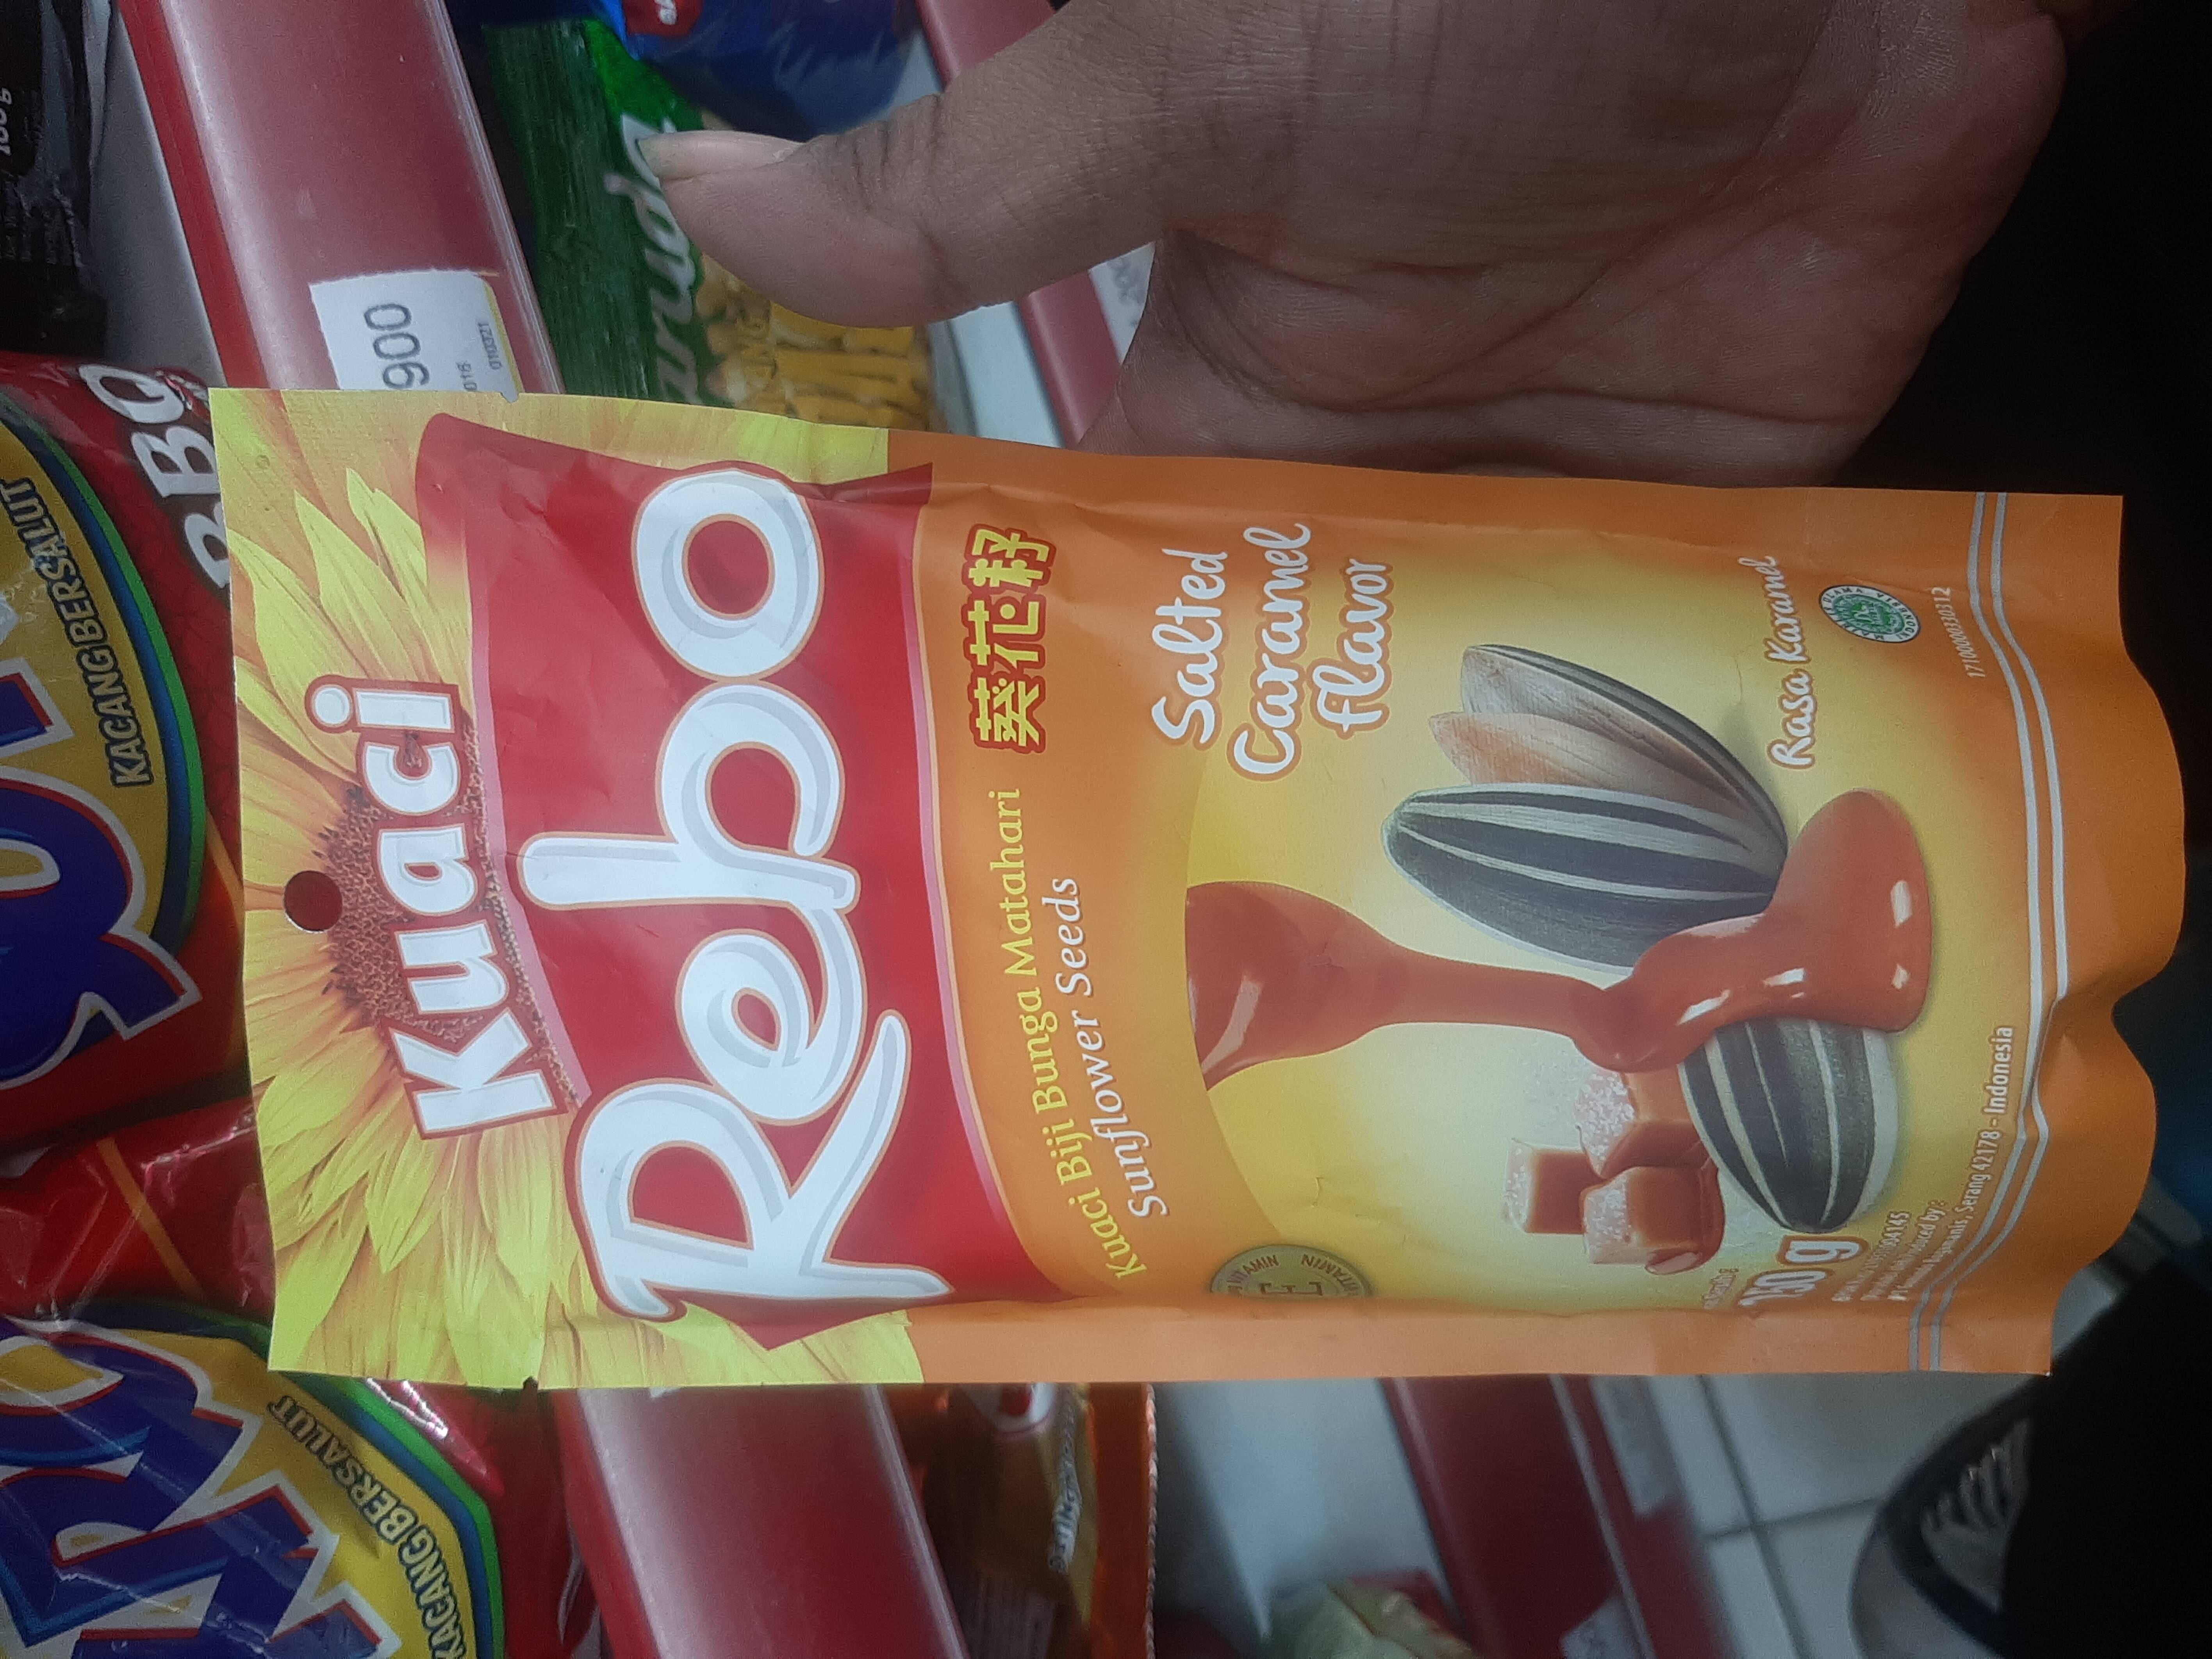 Rebo Kuaci Caramel 150Gr - Produk - id